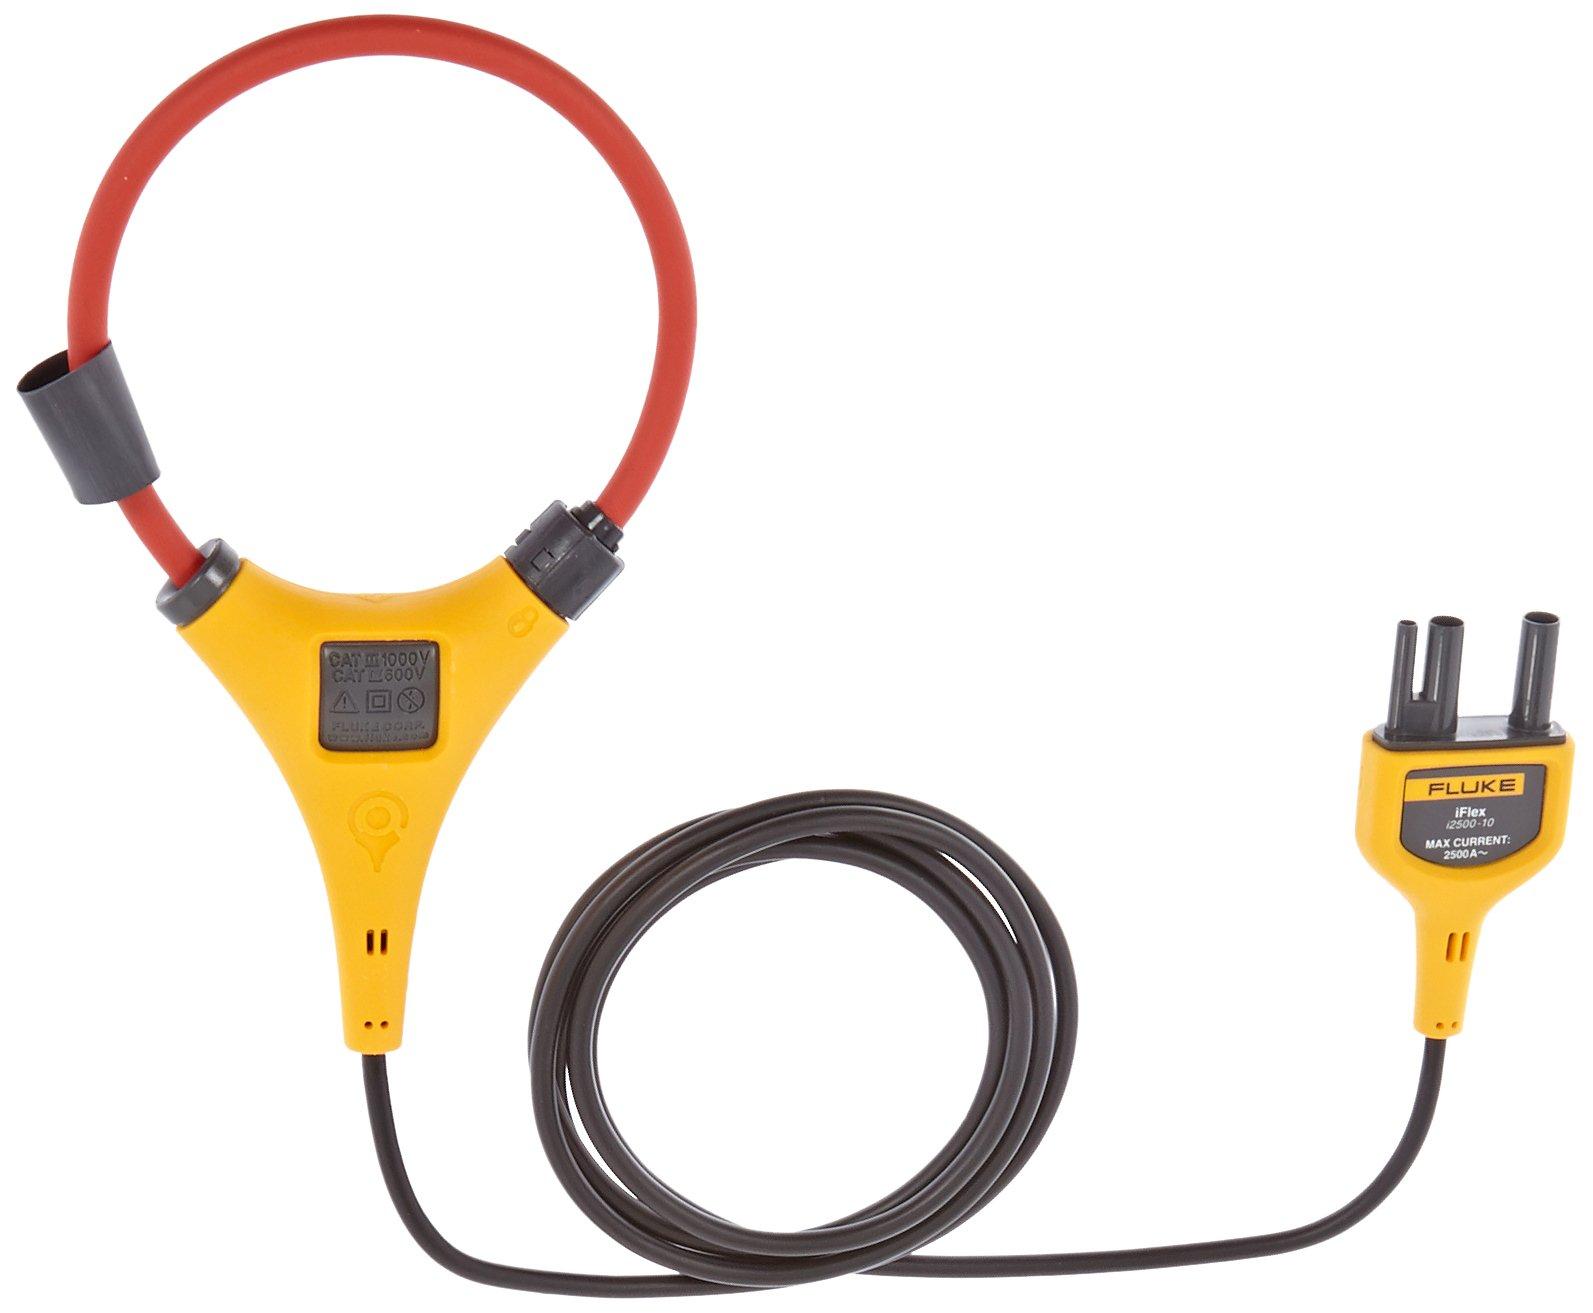 Fluke I2500-10 IFlex Flexible Current Probe, 2500A Current, 0.1A Resolution, 10'' Size